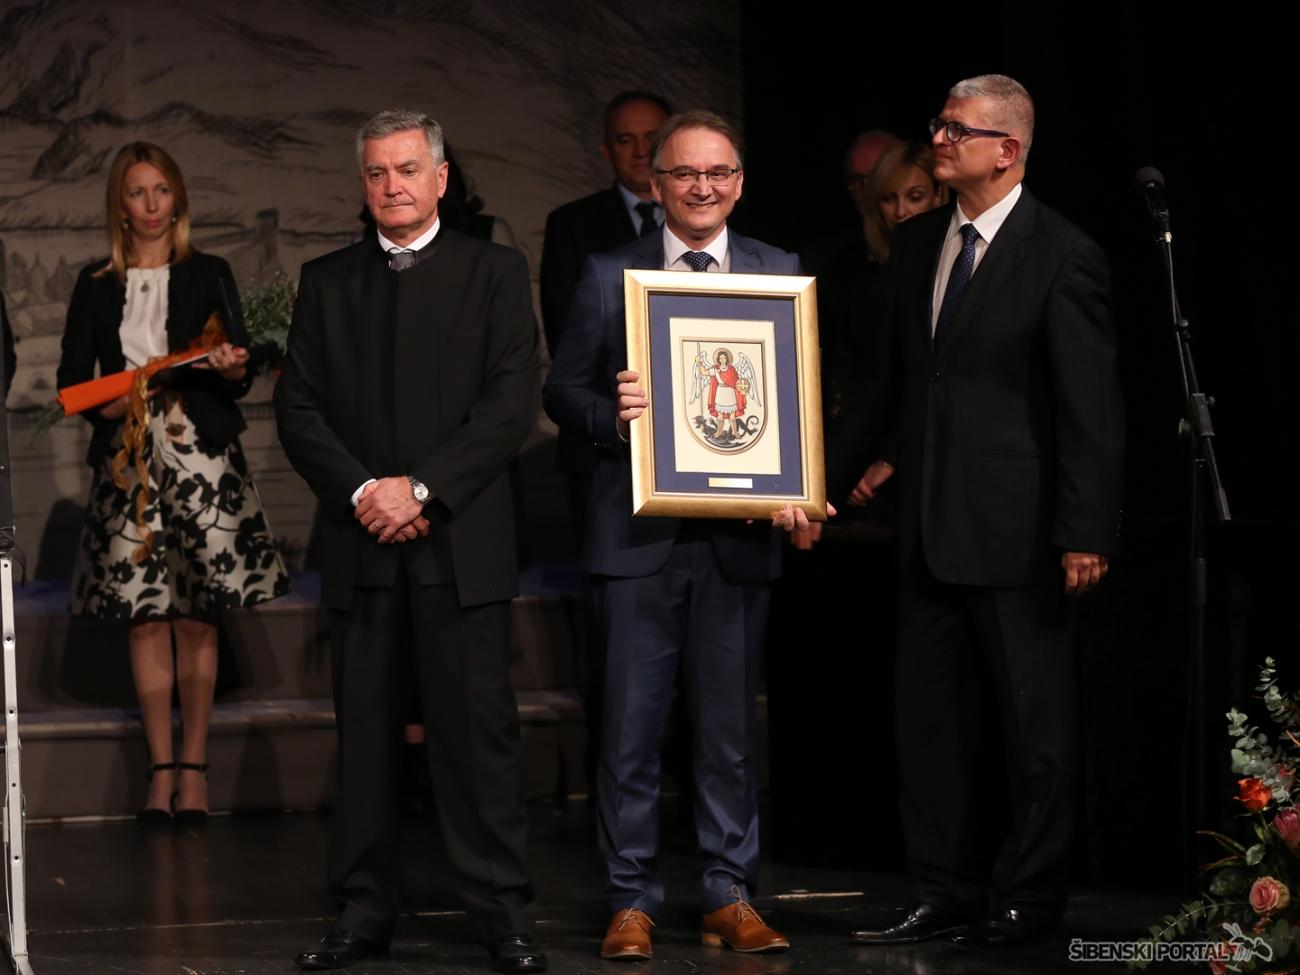 nagrada grada sibenika 280917 13